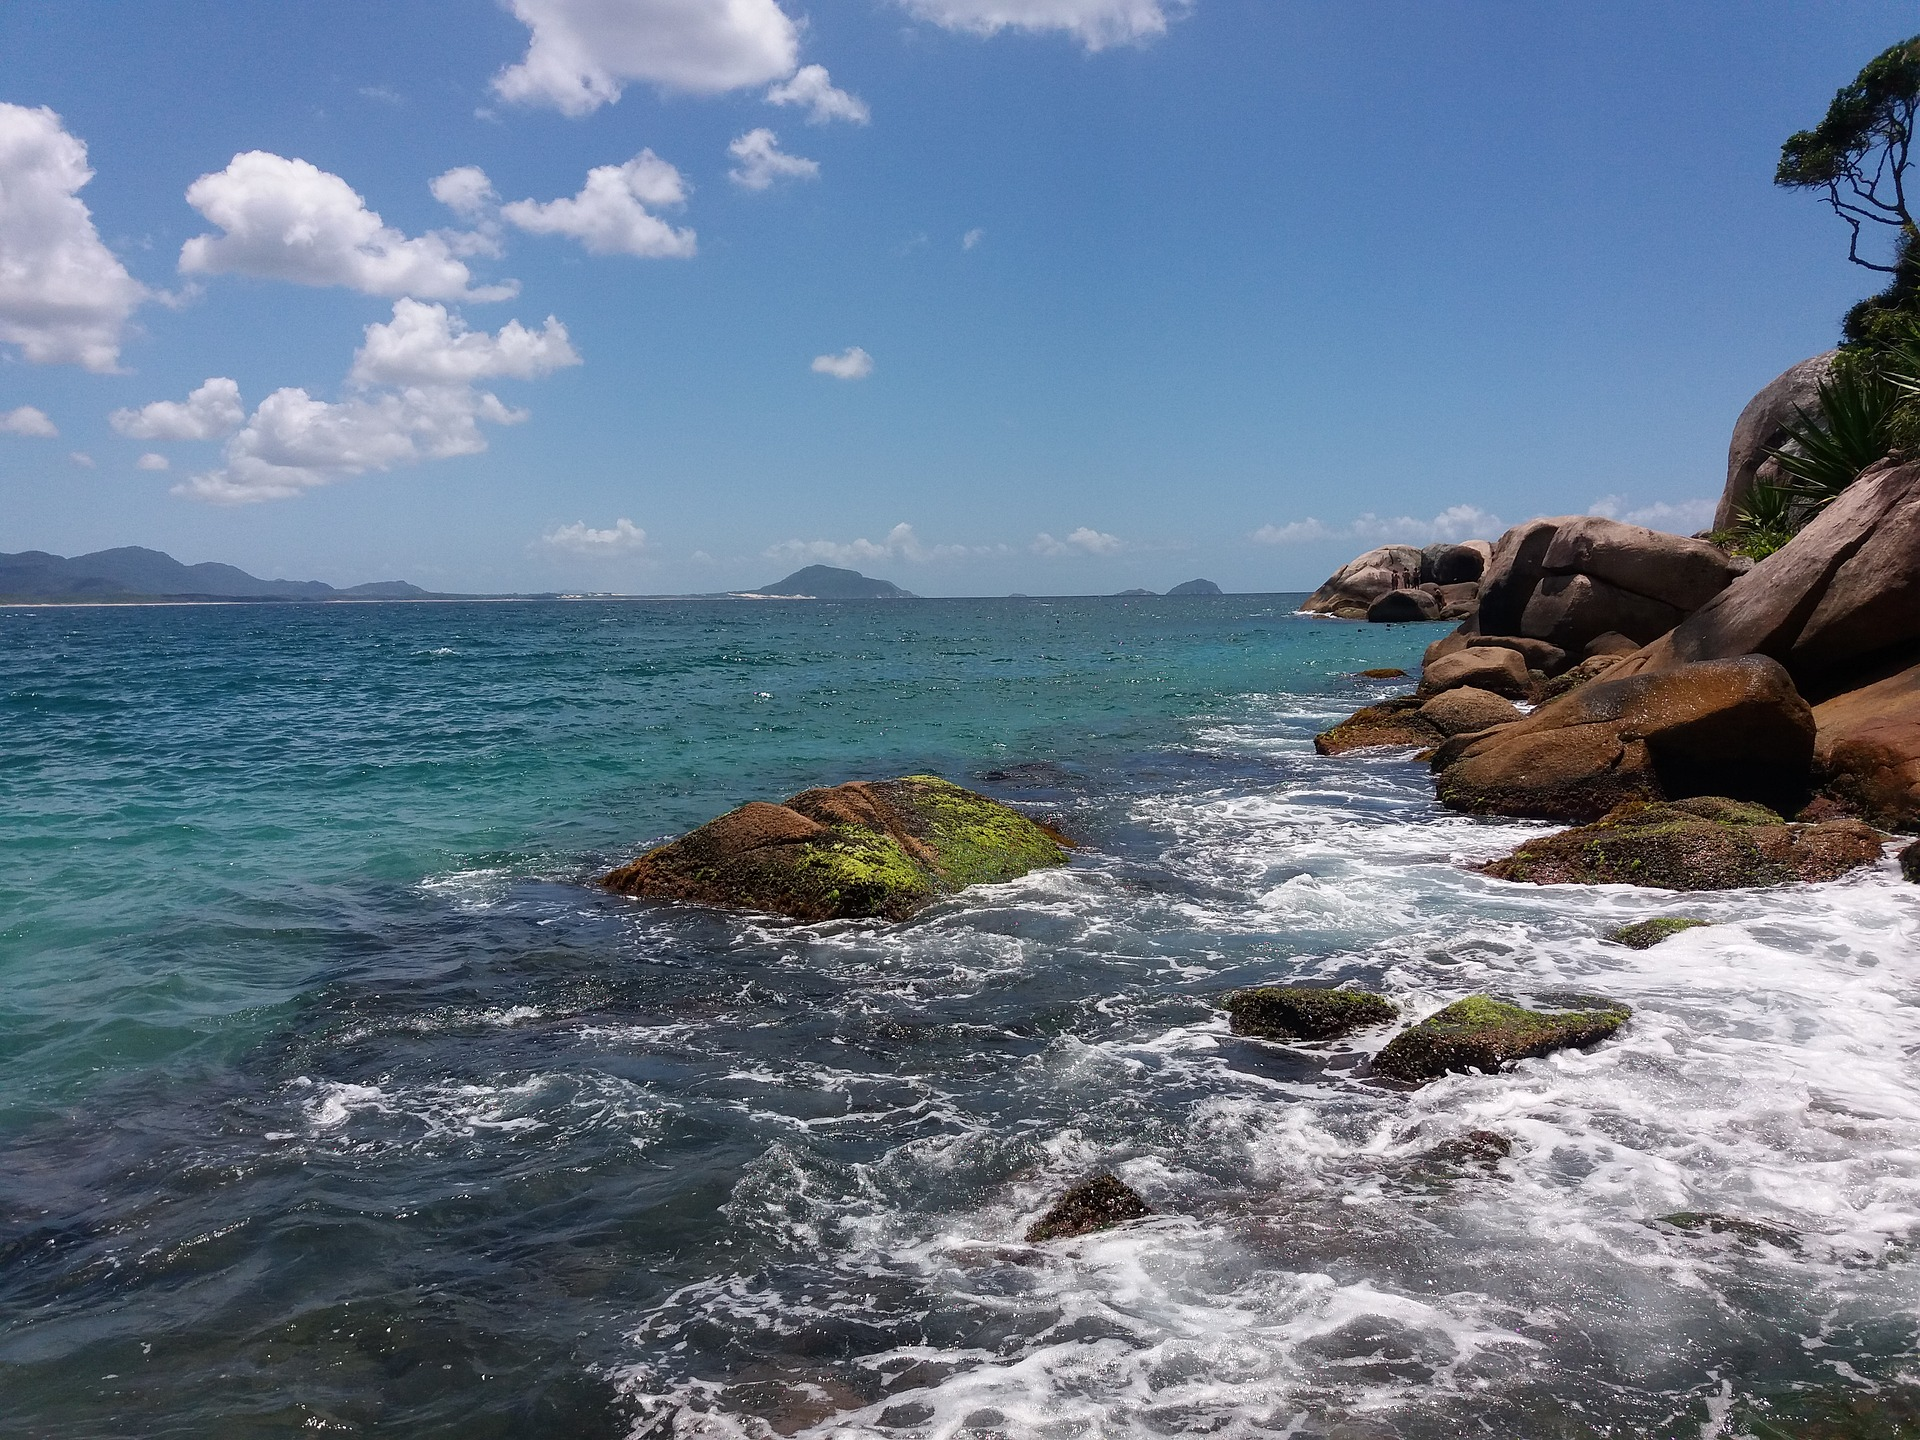 Canasvieiras y Jureré: Mis playas favoritas en Florianópolis